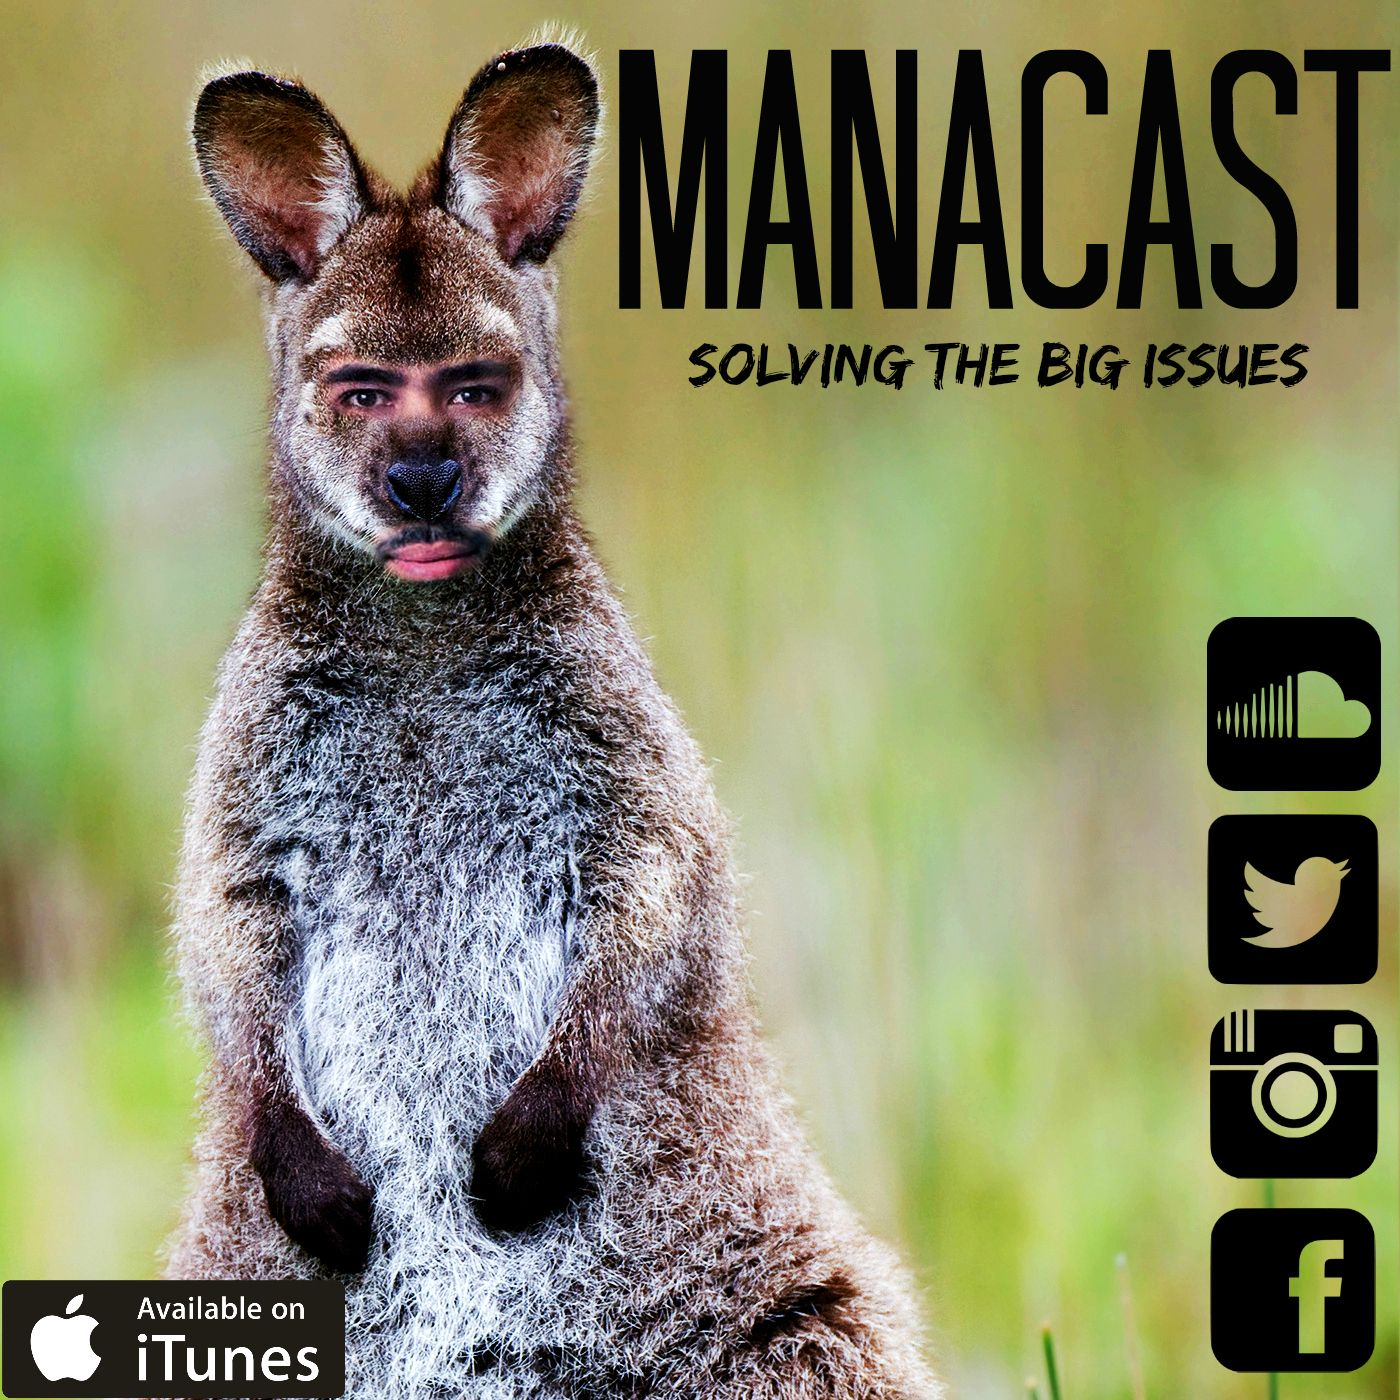 The Manacast